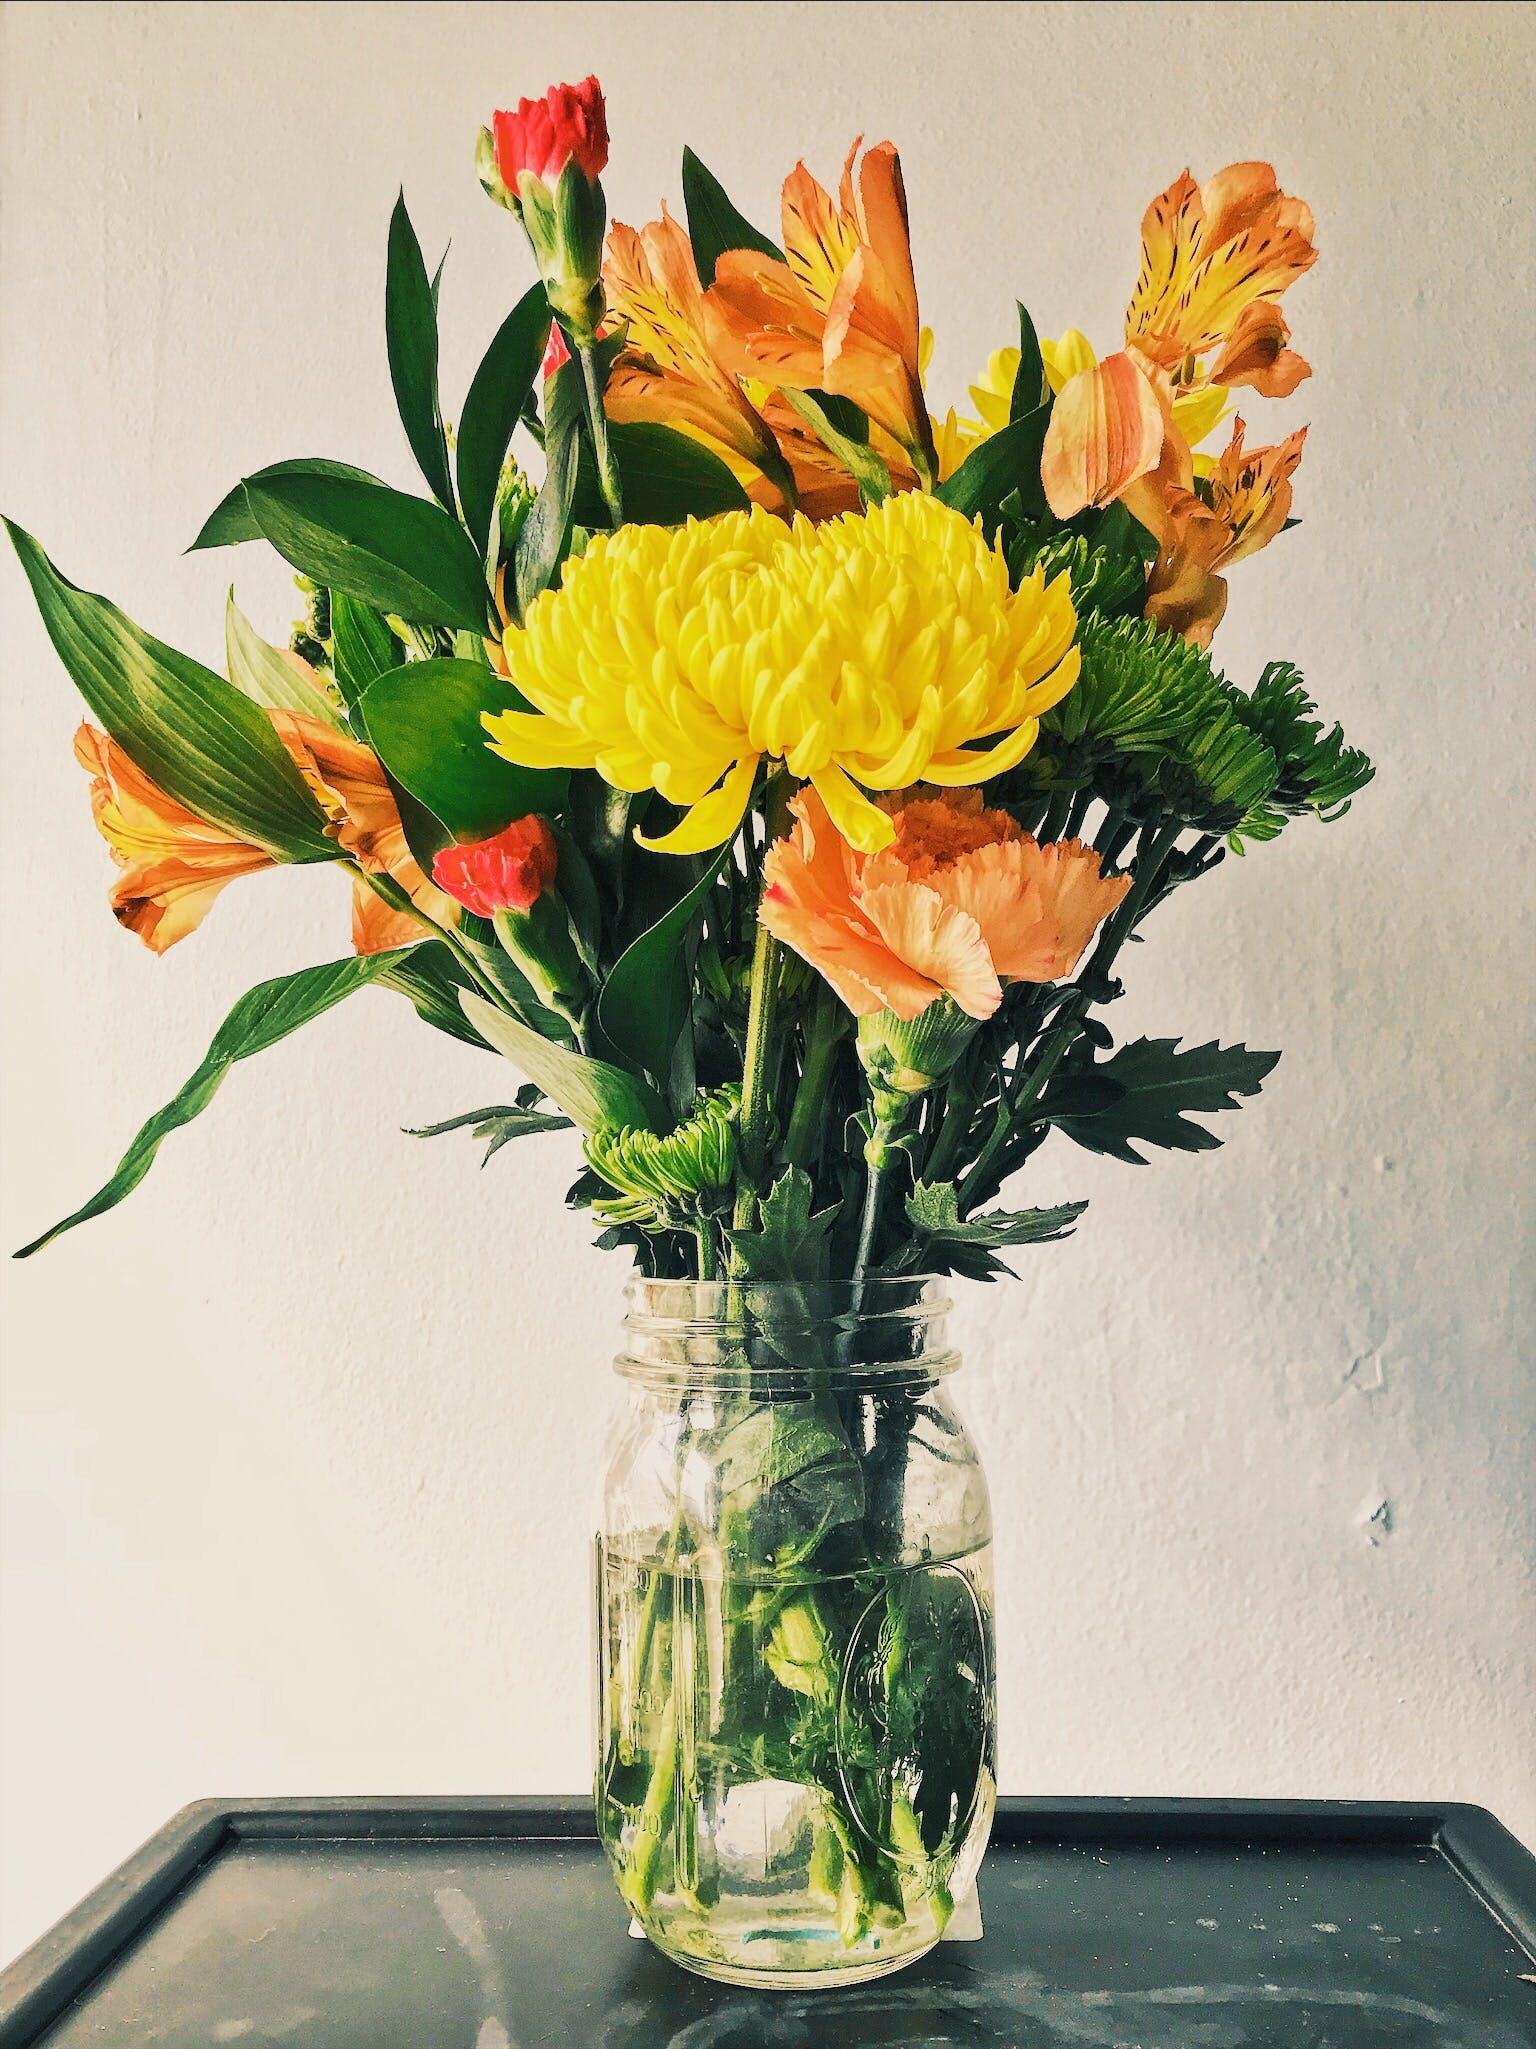 Yellow Mums, Orange Peruvian Lilies, and Carnation Flower Arrangement